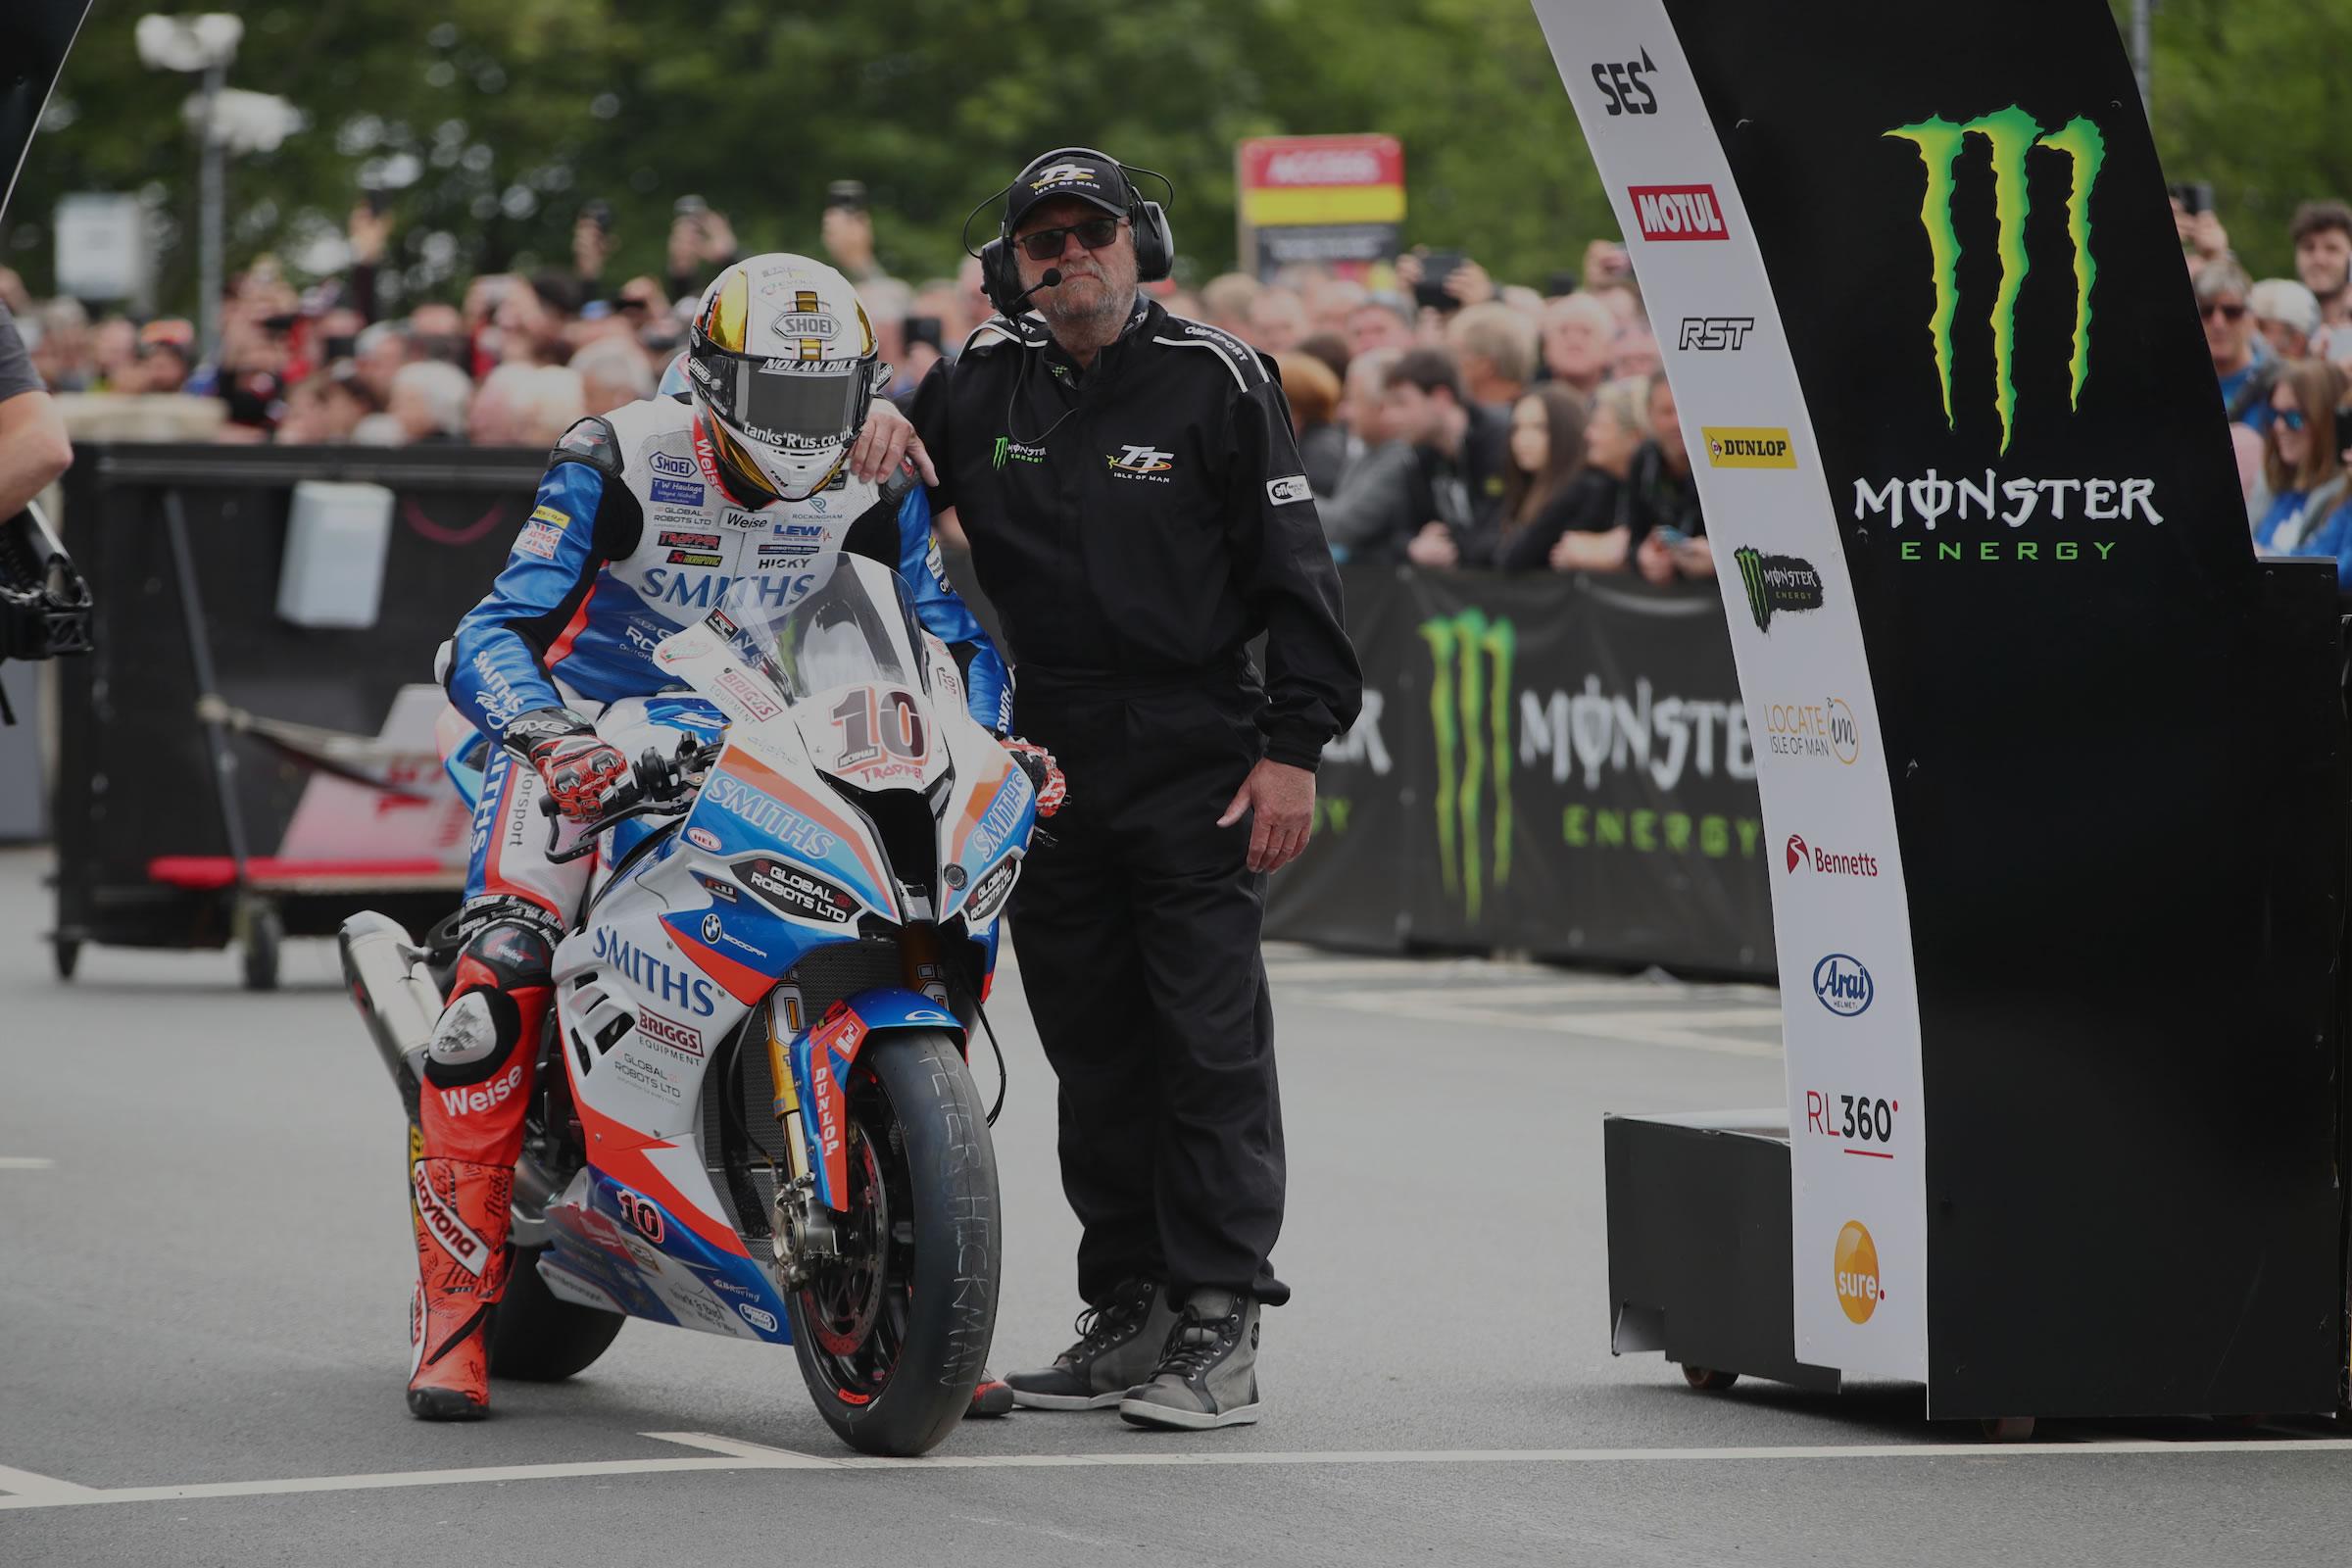 Peter Hickman - Isle of Man TT 2019 Senior TT Start Line